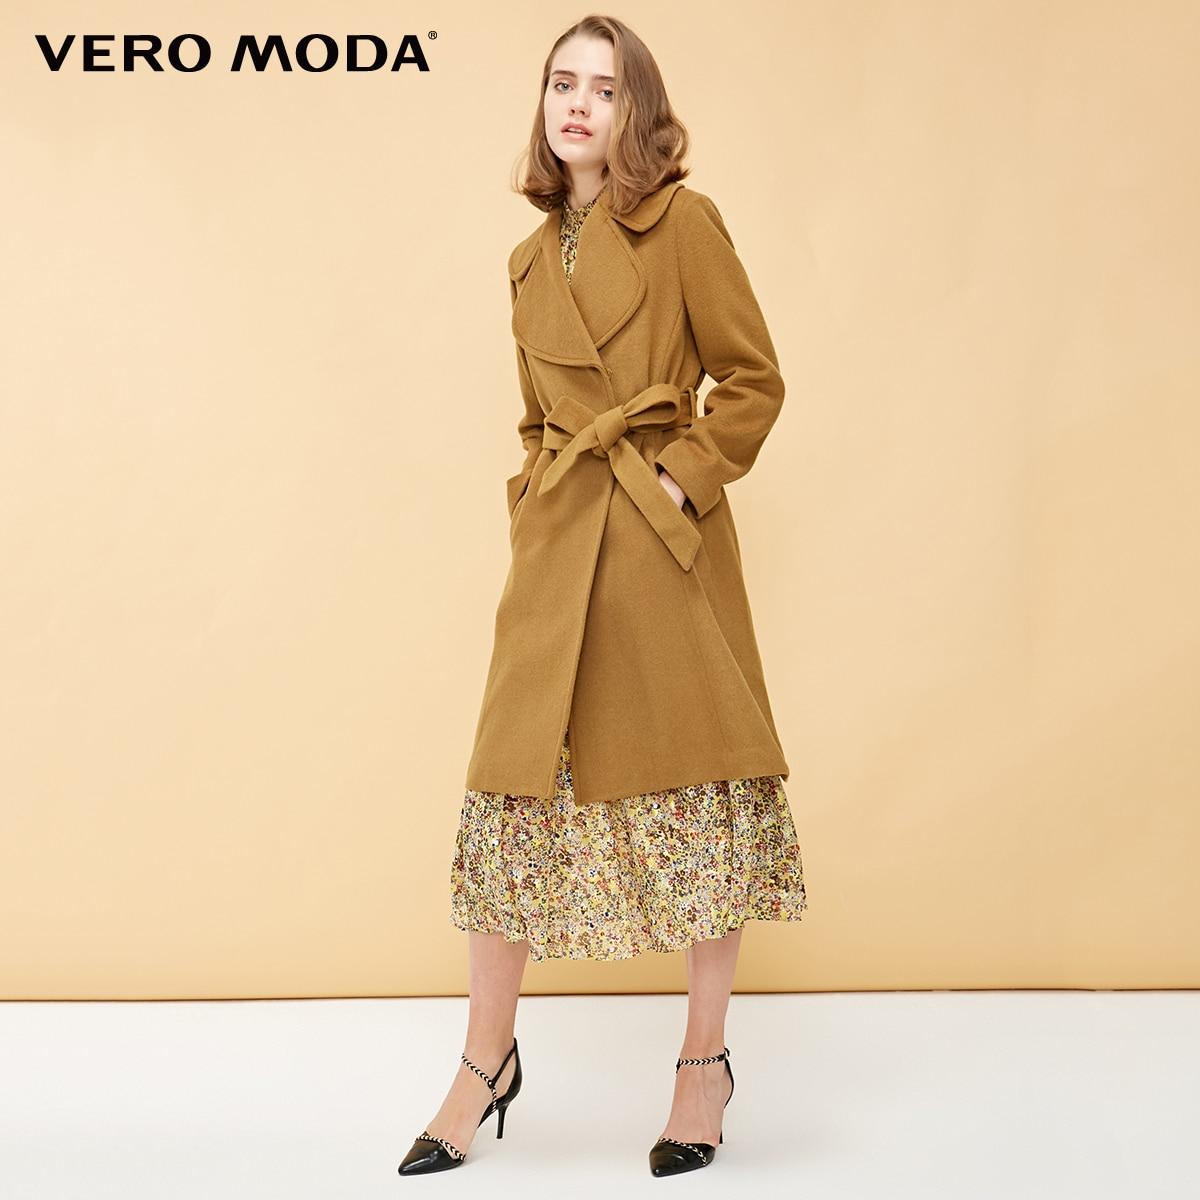 Vero Moda Women's 52% Wool Invisible Snap Wool Coat | 318327549